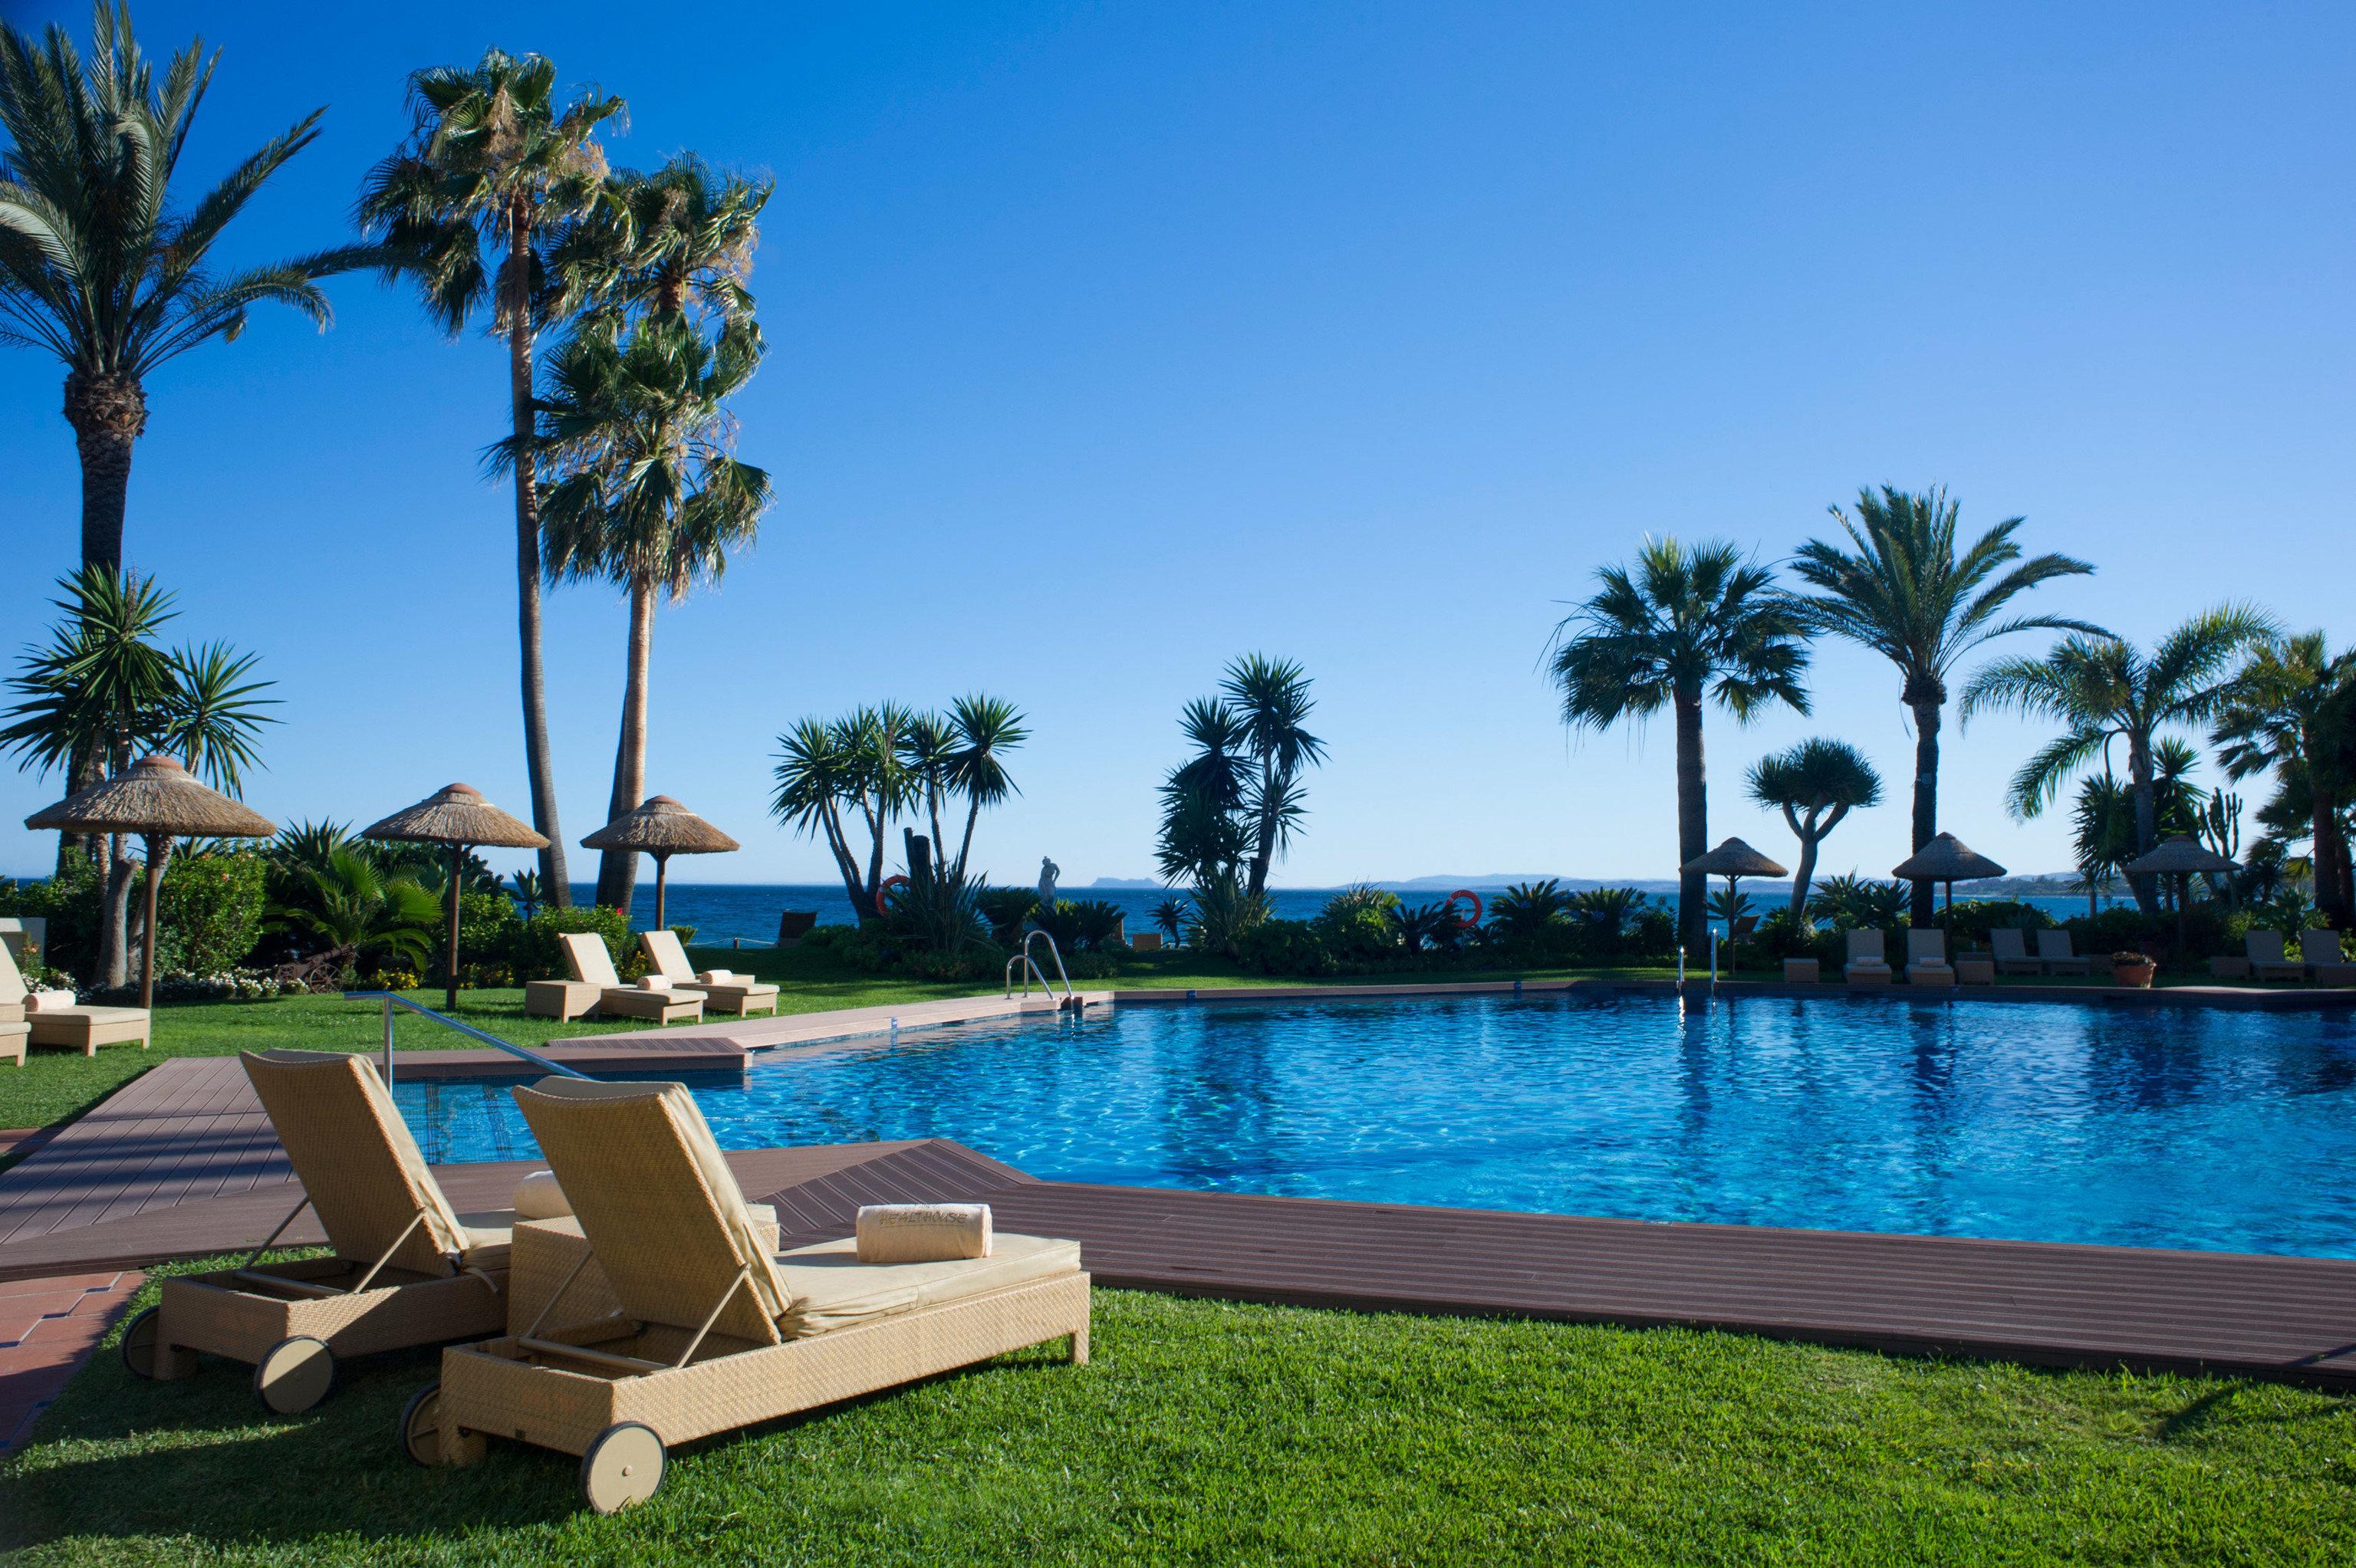 sky tree water grass umbrella chair palm swimming pool property leisure Resort lawn Villa caribbean arecales condominium backyard Beach mansion Pool overlooking